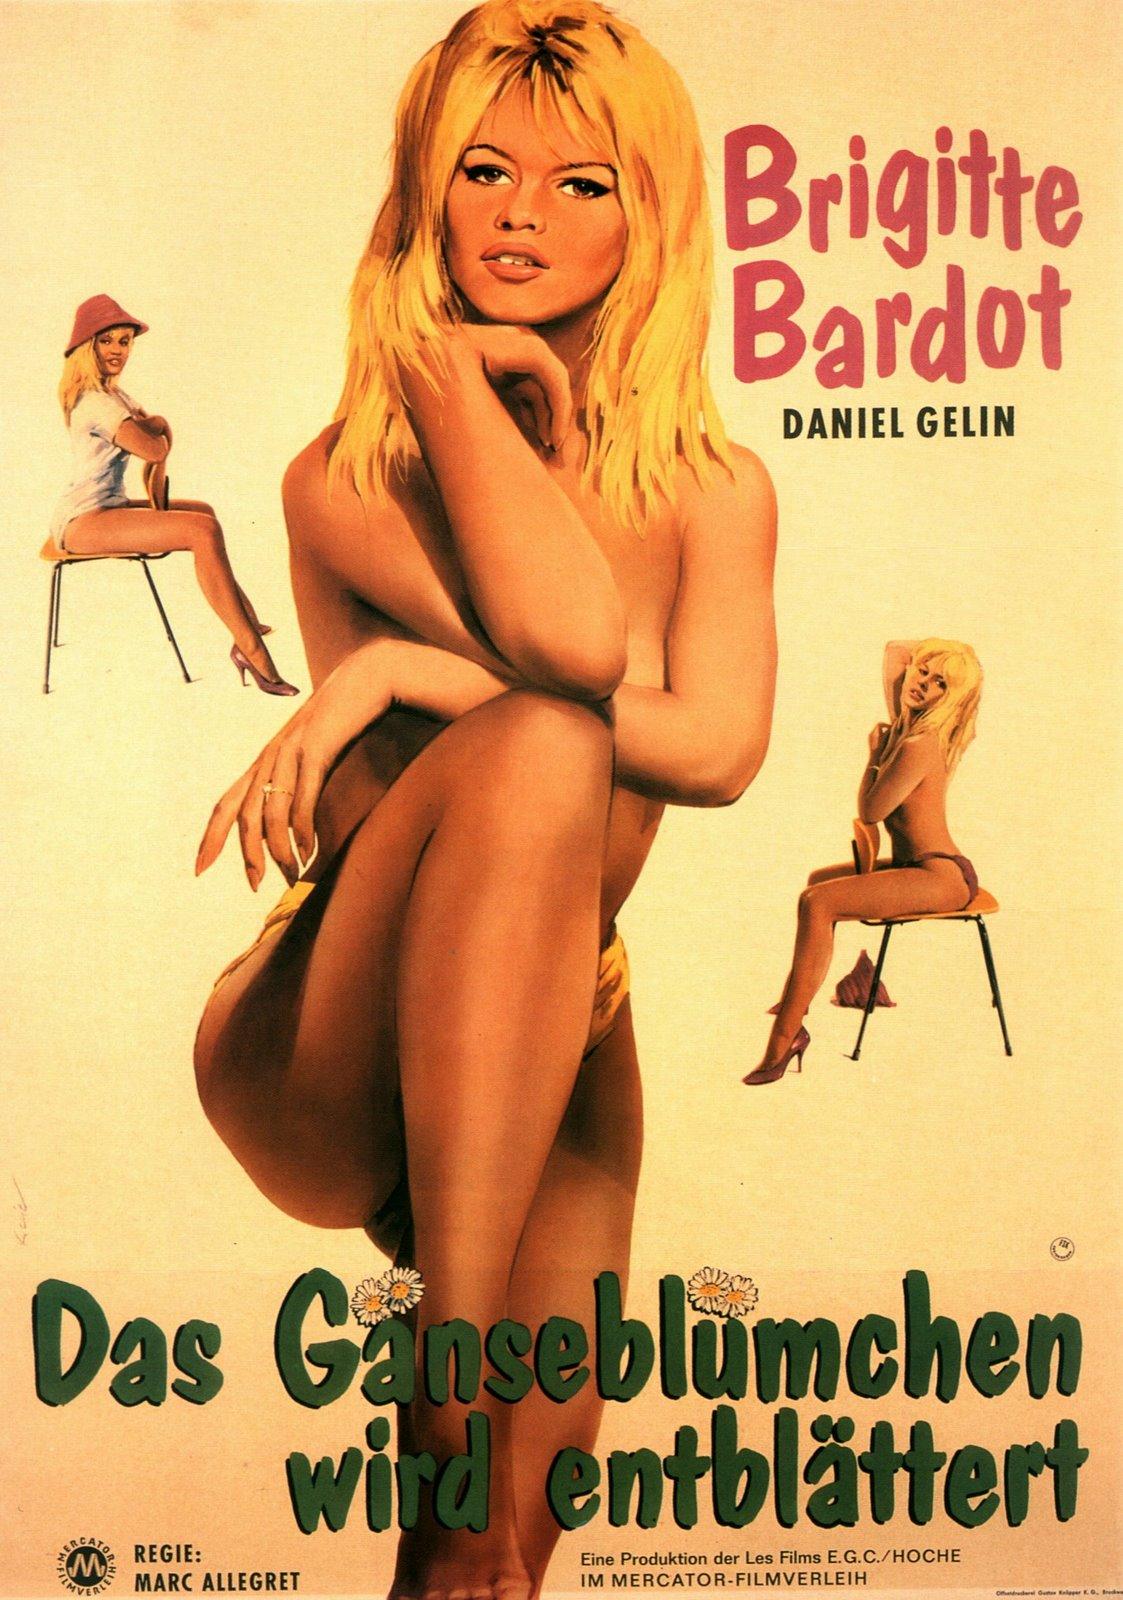 http://4.bp.blogspot.com/_ir6h9Q90O7g/TSaqrMBjR2I/AAAAAAAAB5o/VY2jf5LifJ8/s1600/Brigitte+Bardot+poster+09.jpg